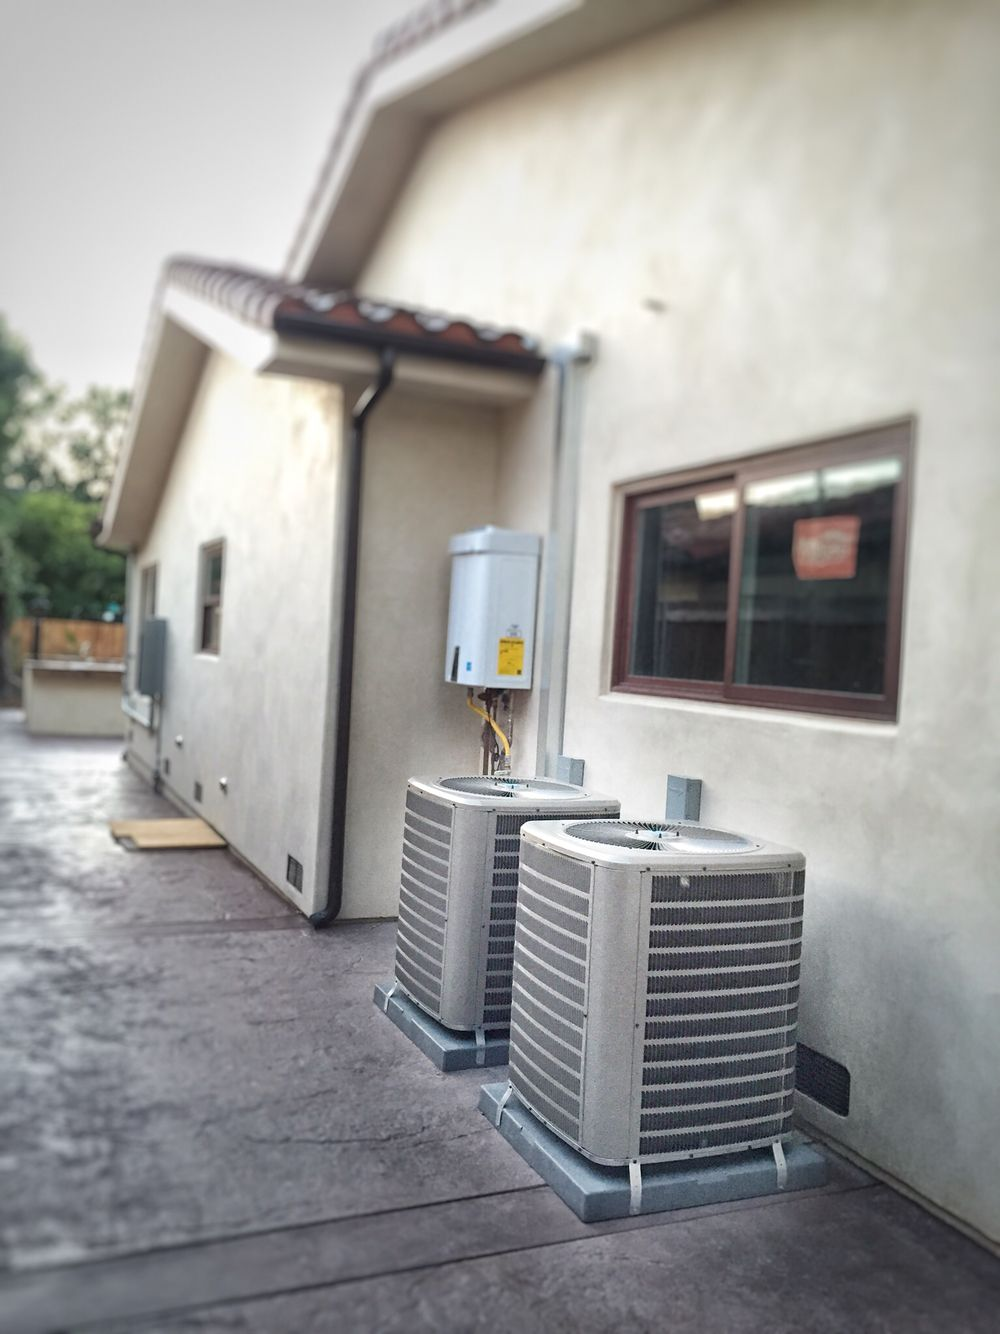 410A Condensing units installation. Modern appliances